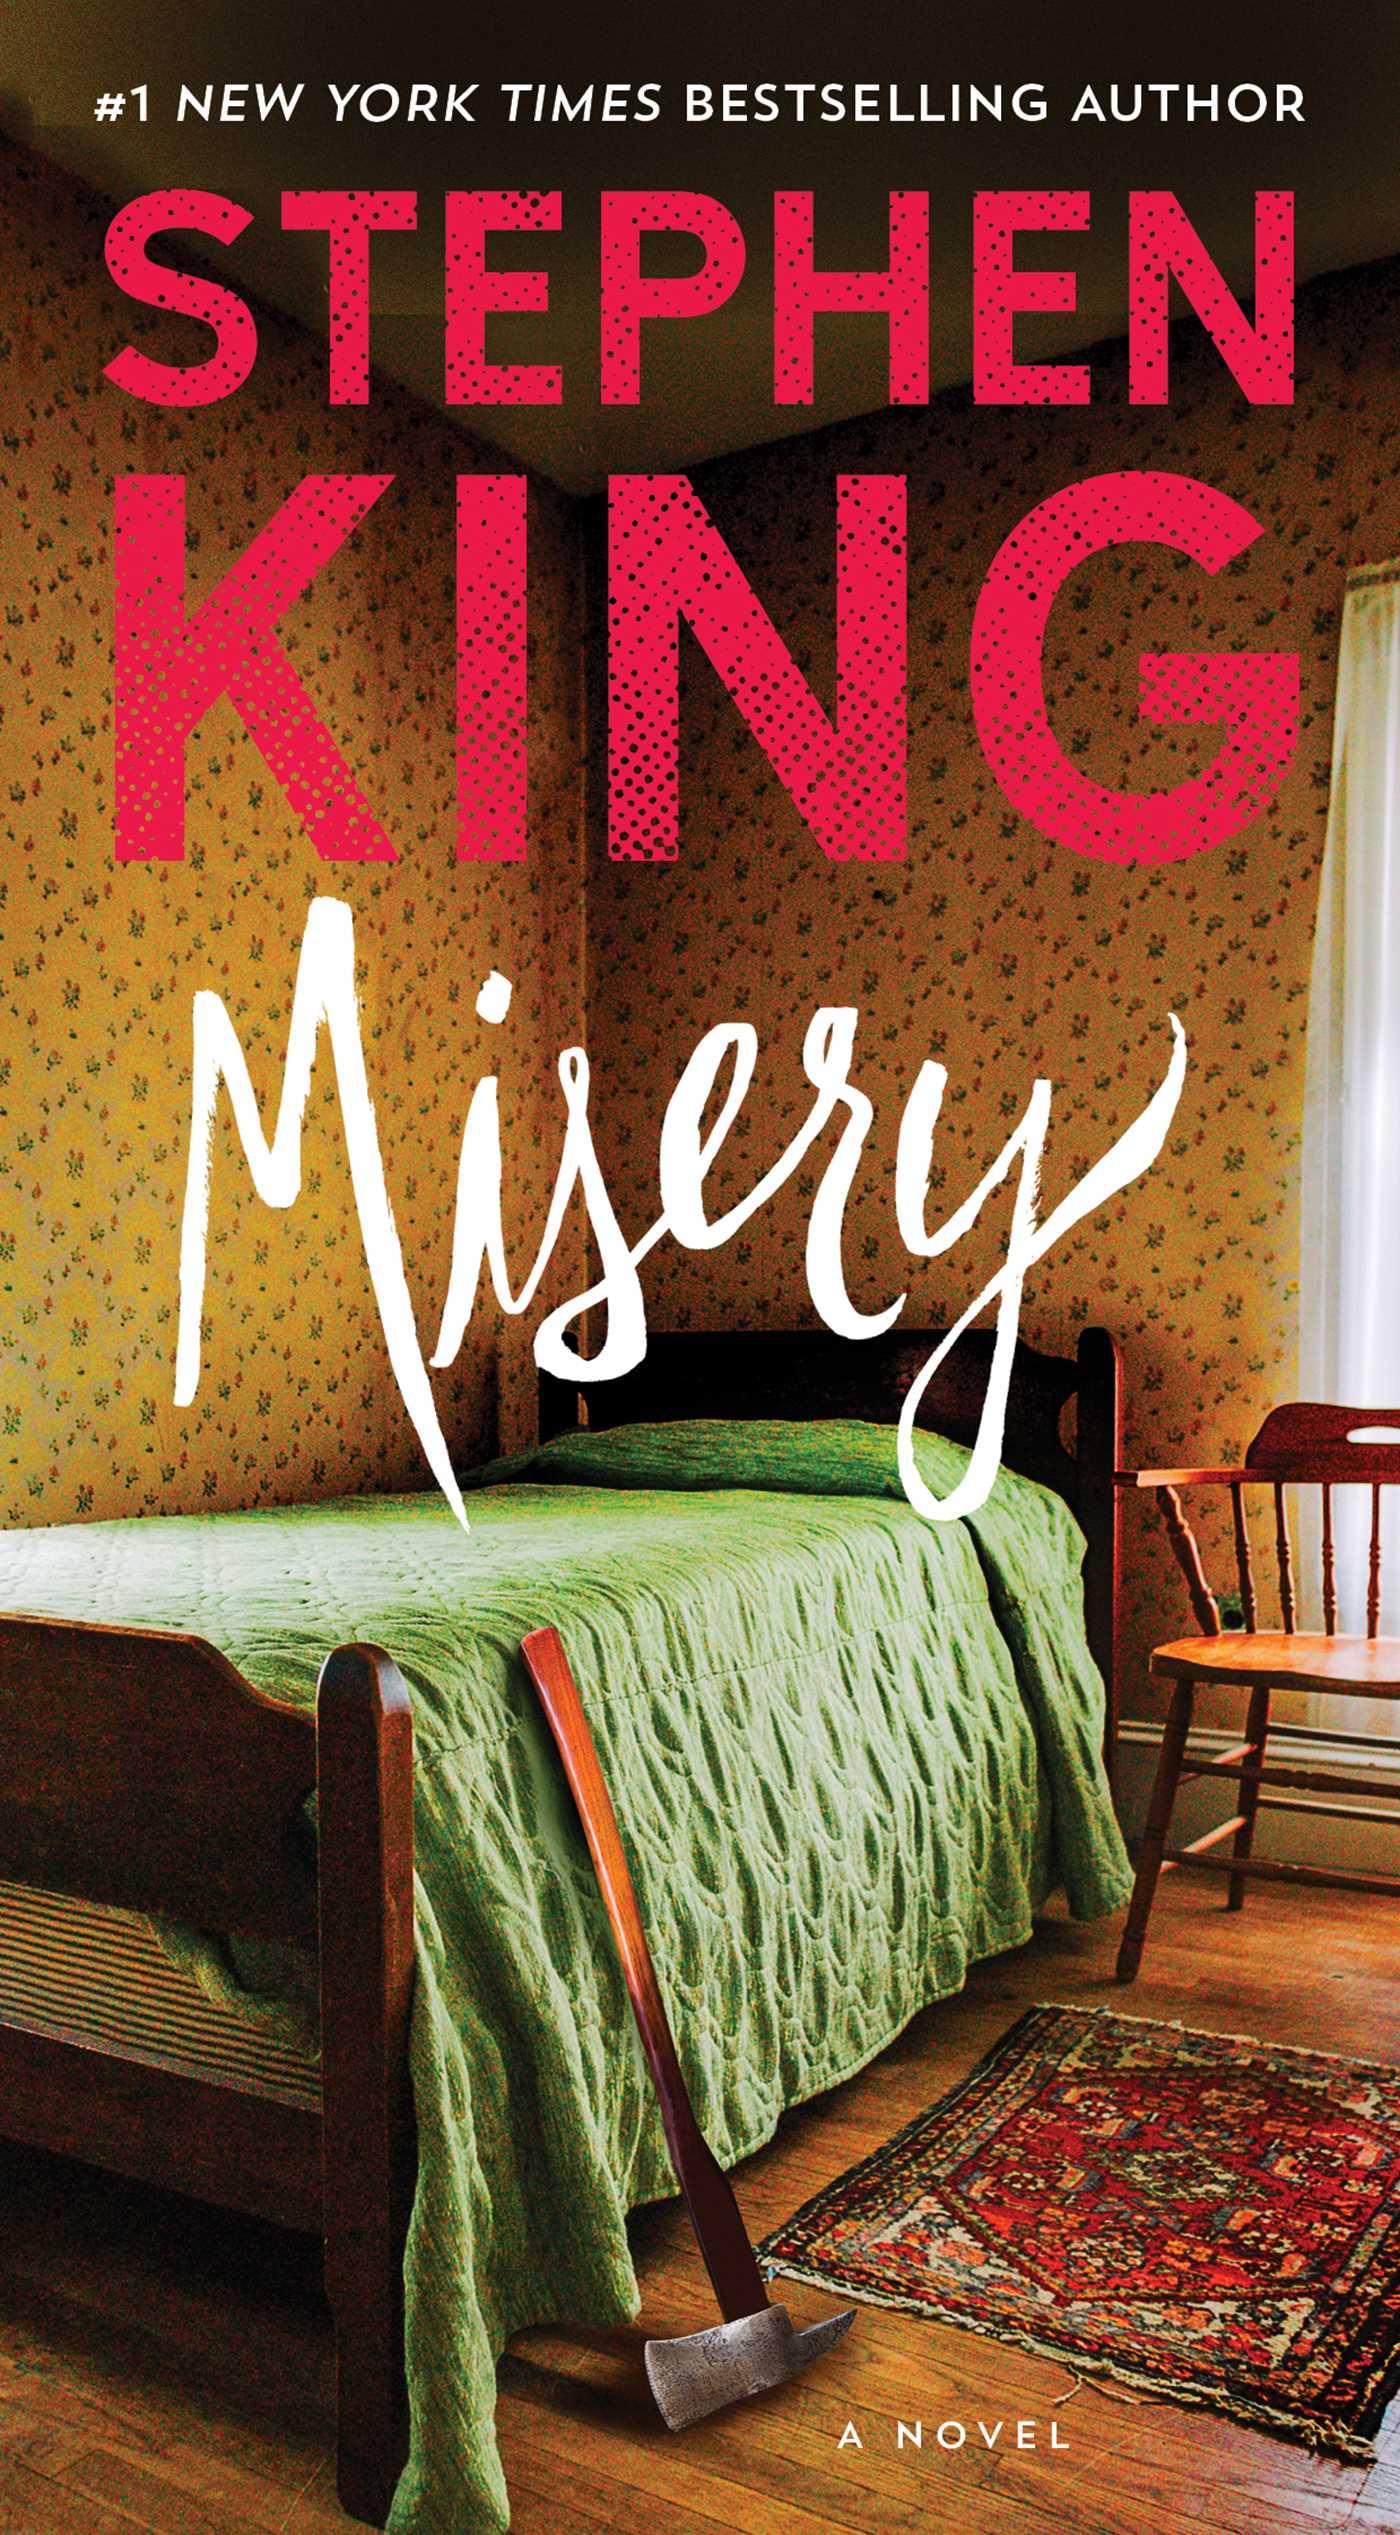 Stephen King Misery.jpg